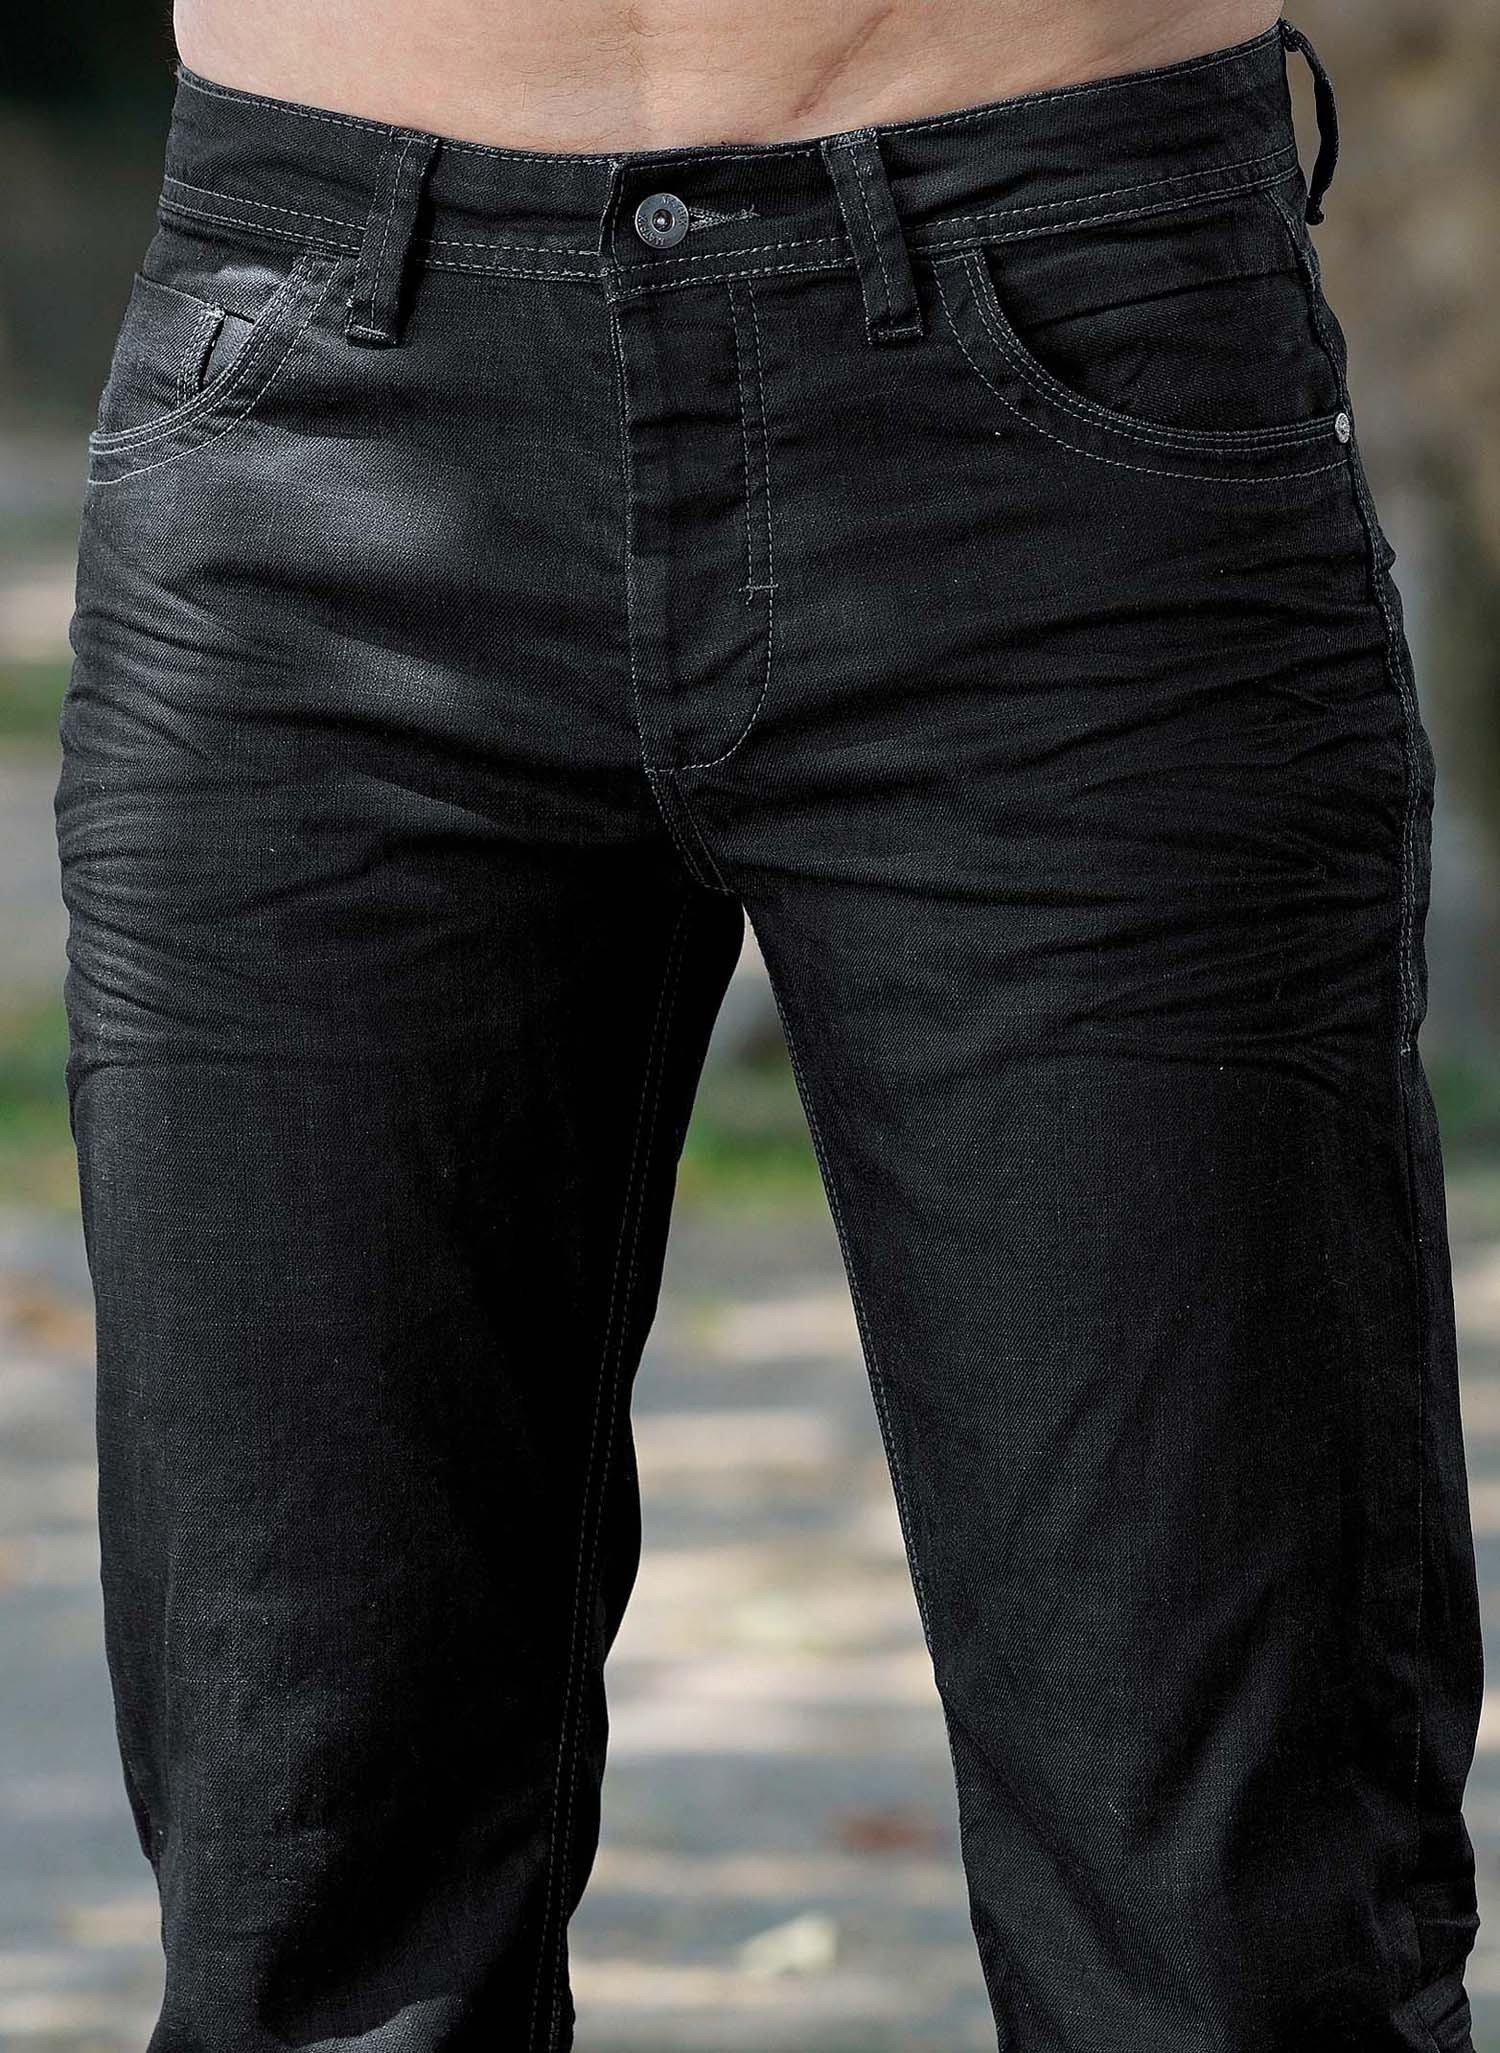 H-5-P-Jeans,Knopfvers.Black-D. 50 - 2 - Ronja.ch